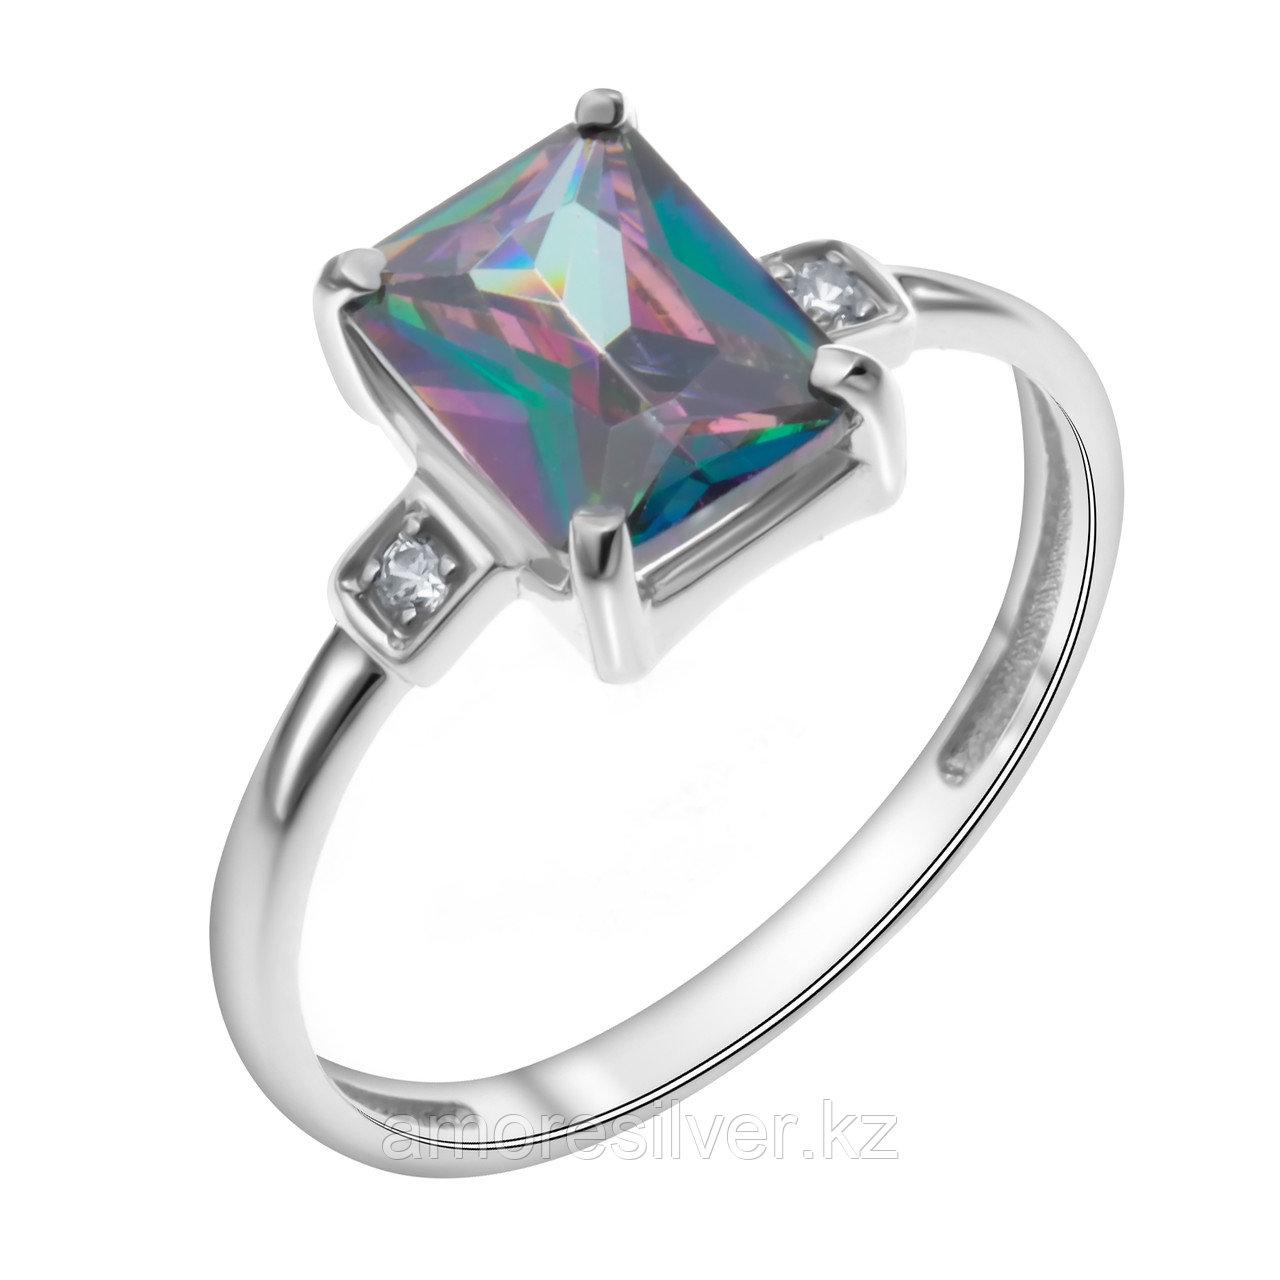 "Кольцо TEOSA серебро с родием, цирконий мистик, ""каратник"" 1000-0346-CK размеры - 18"